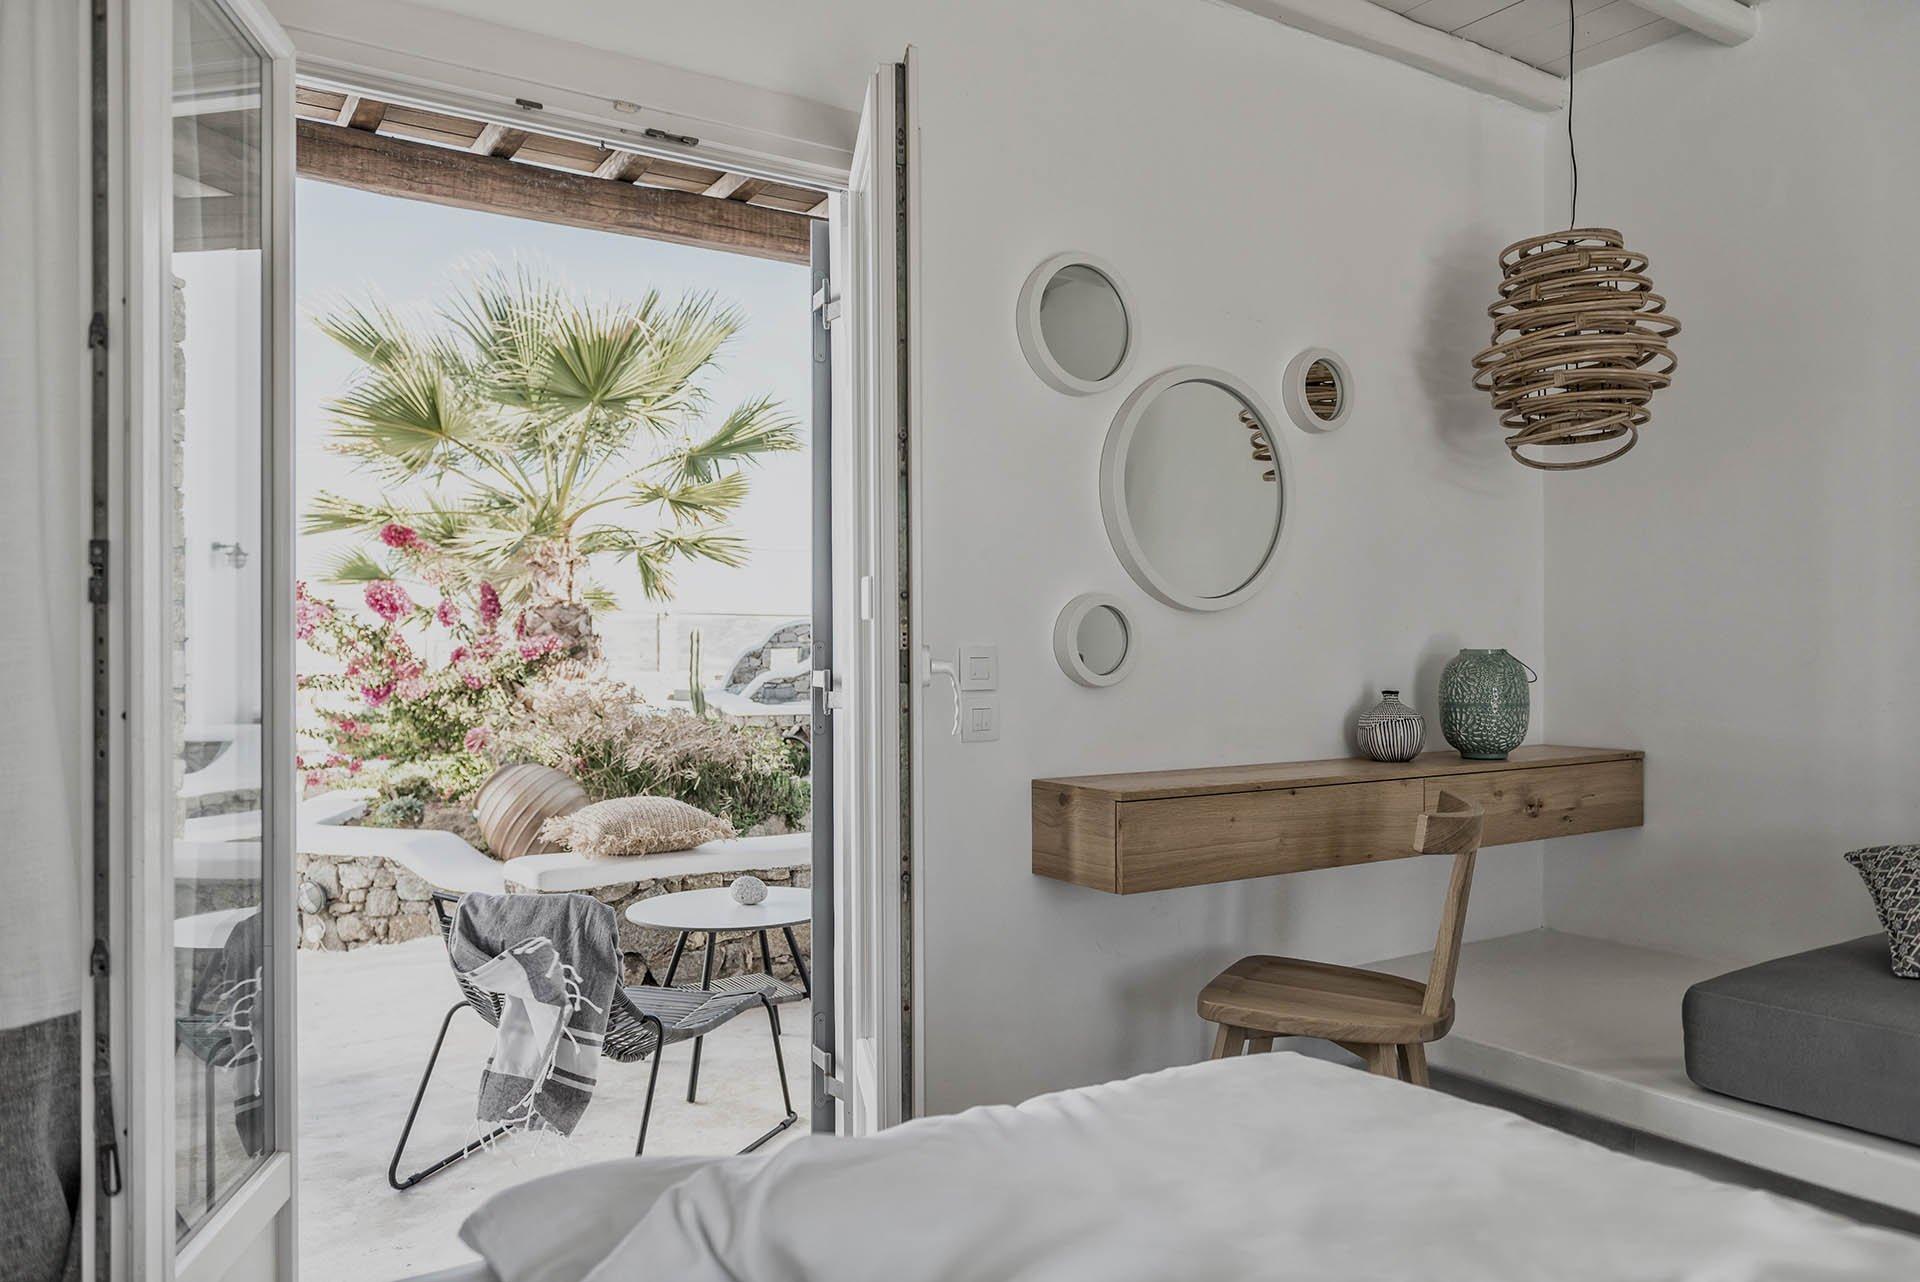 Boutique hotel mykonos | A Hotel Mykonos, Greece